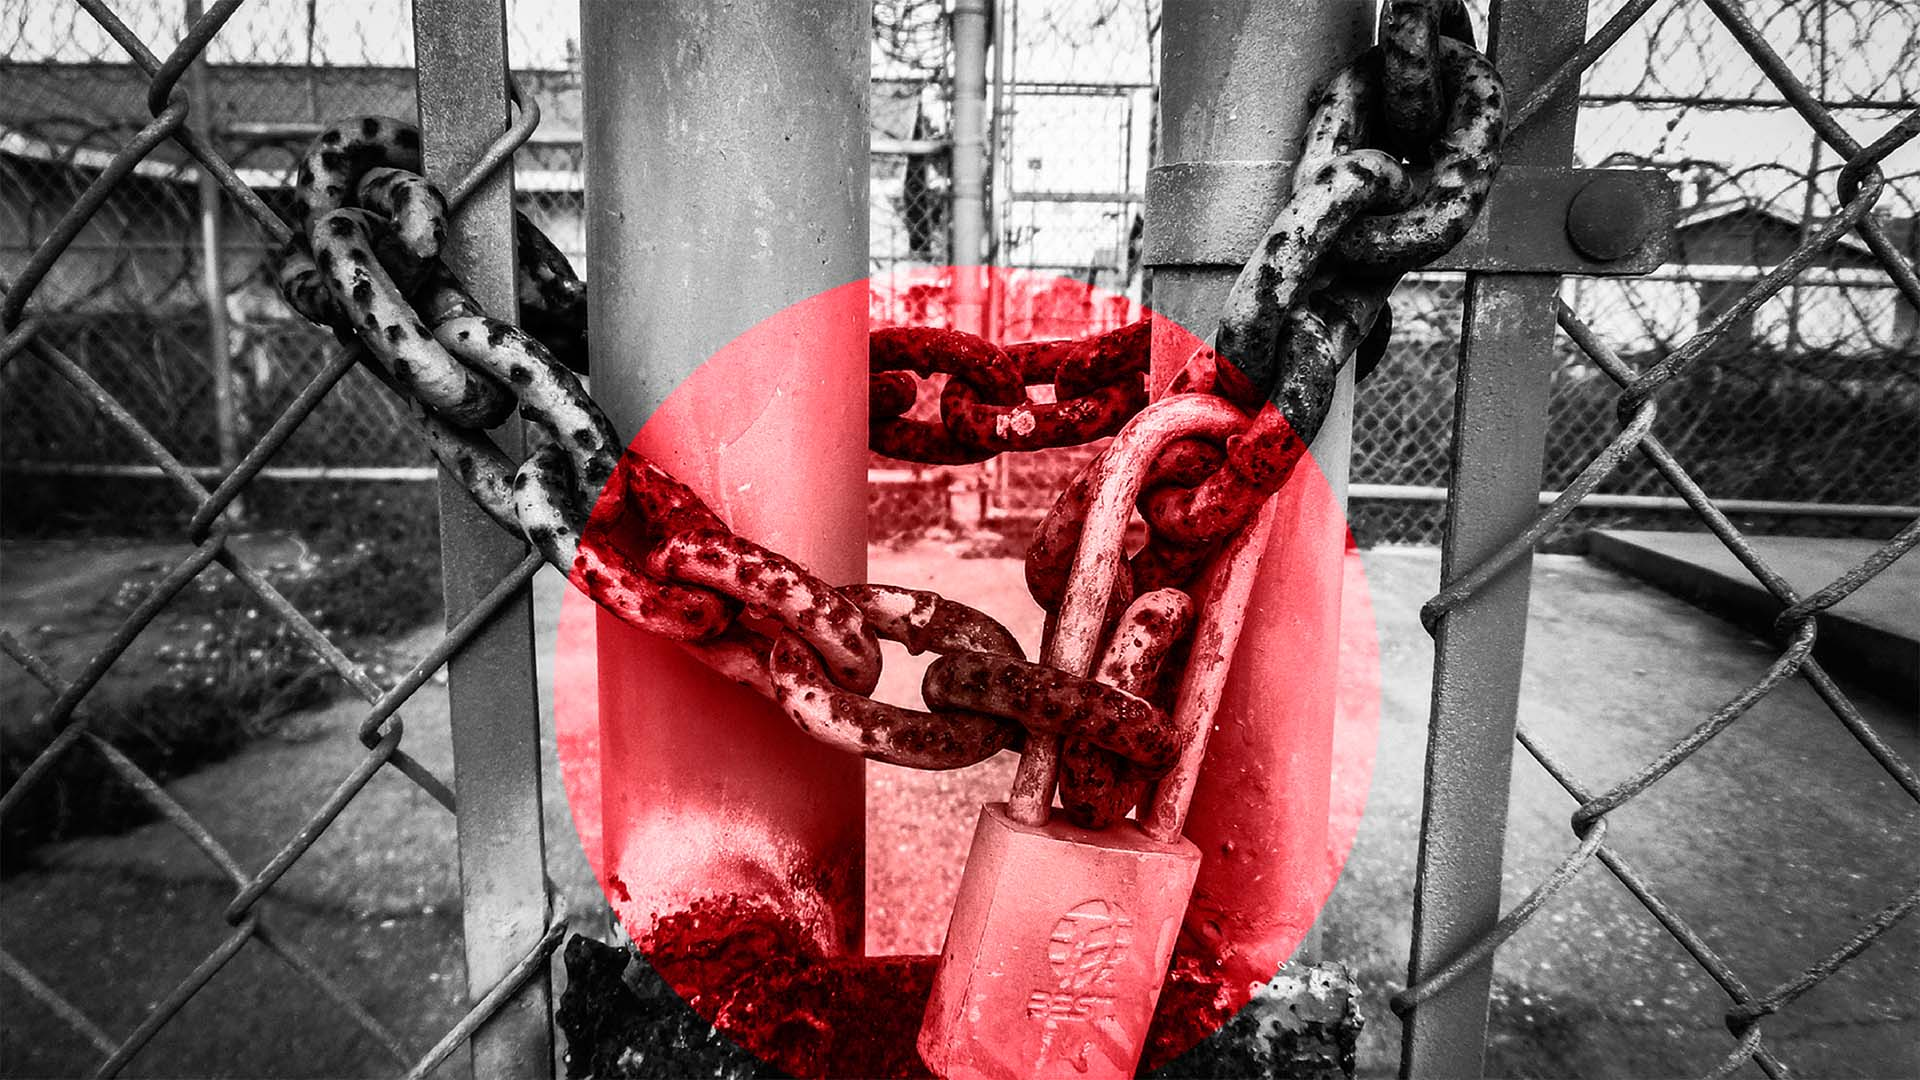 Cerrar cárceles ¿solución o problema?, por Carlos Nieto Palma